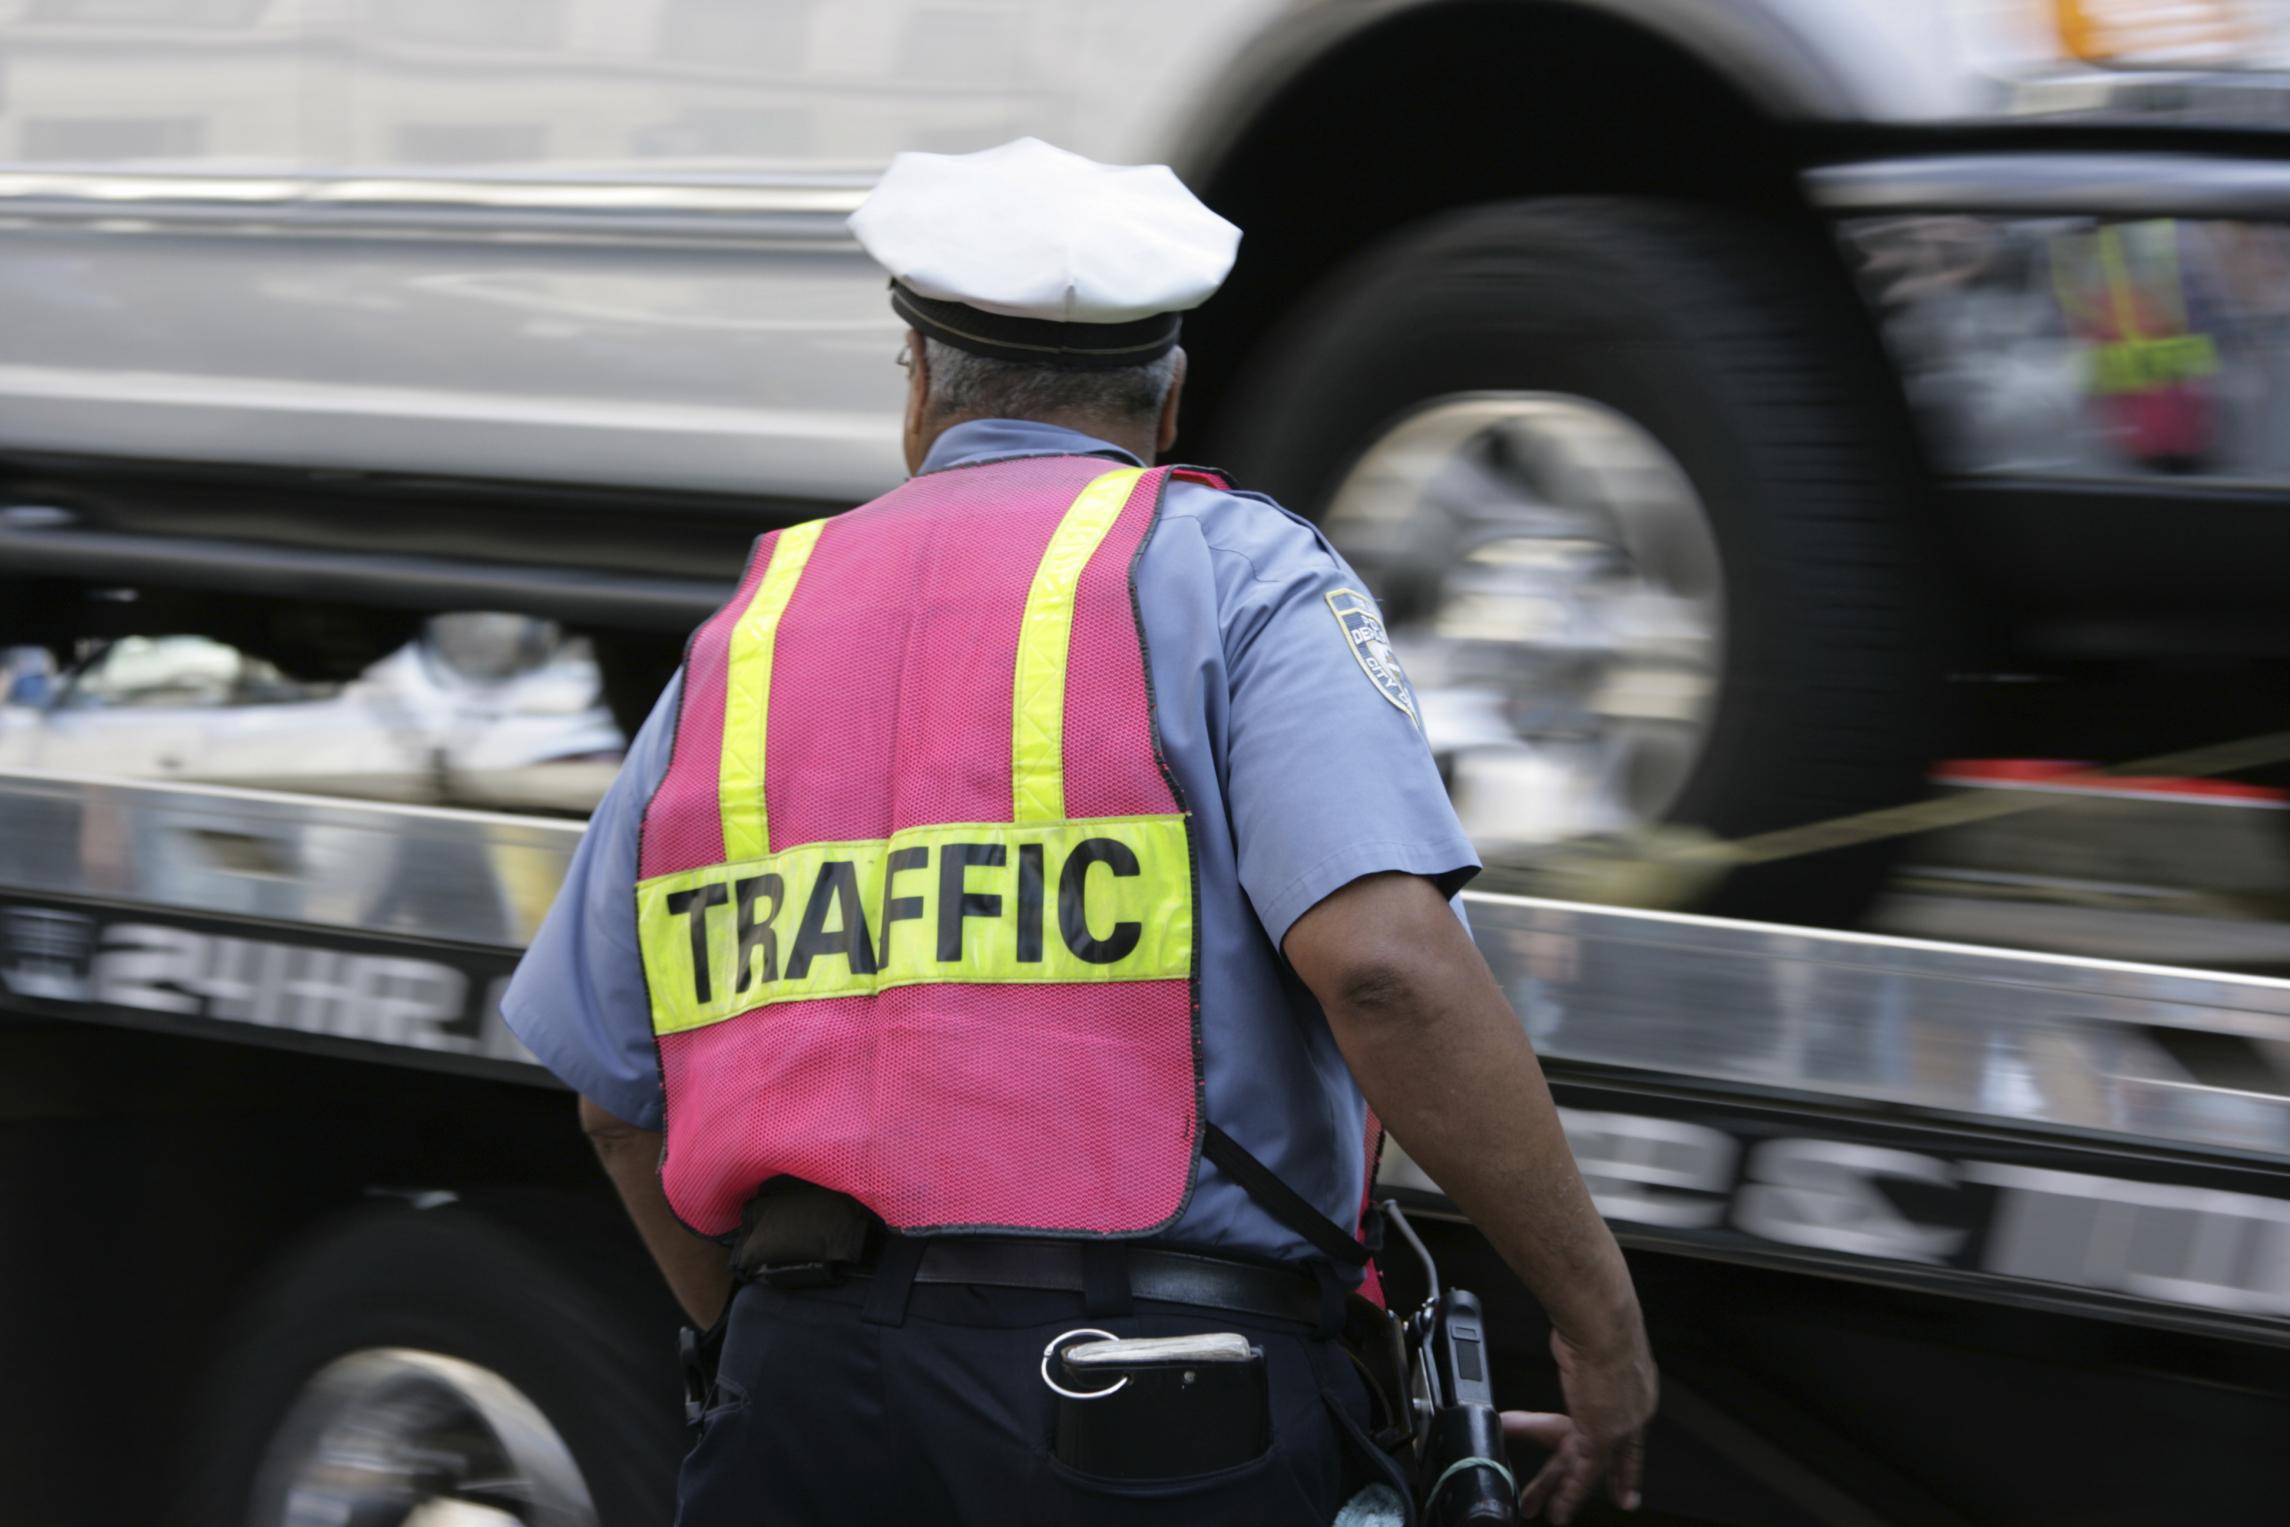 Duties Of A Traffic Officer Career Trend